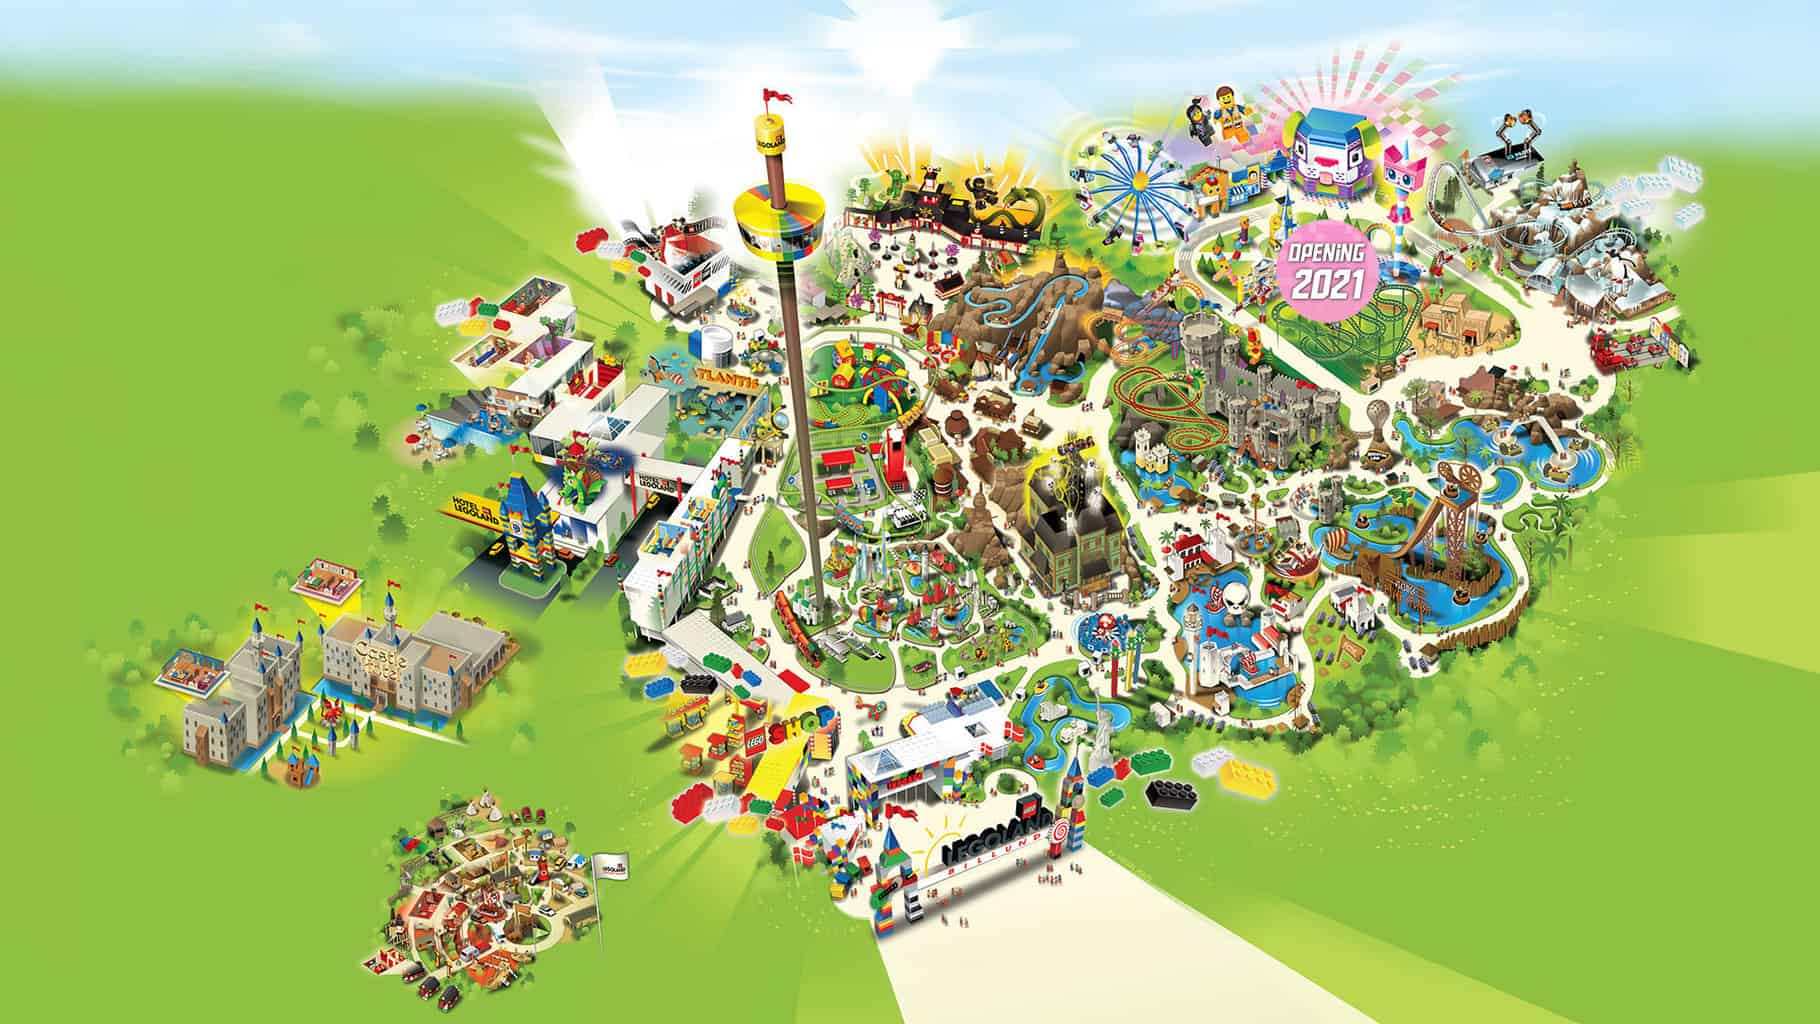 mappa del parco Legoland Billund